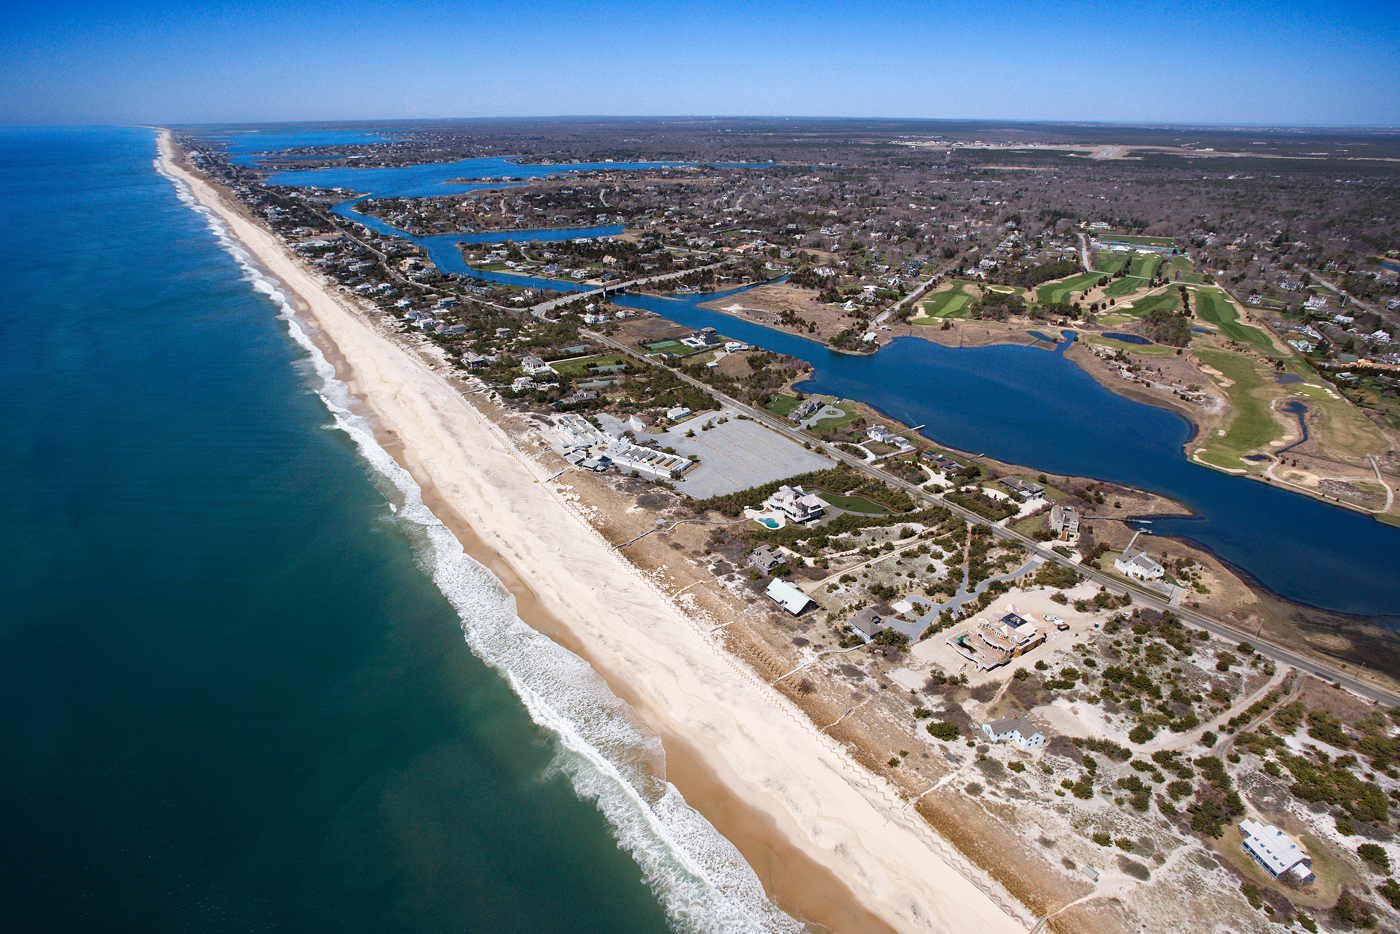 The-Hamptons-Long-Island-New-York.jpg